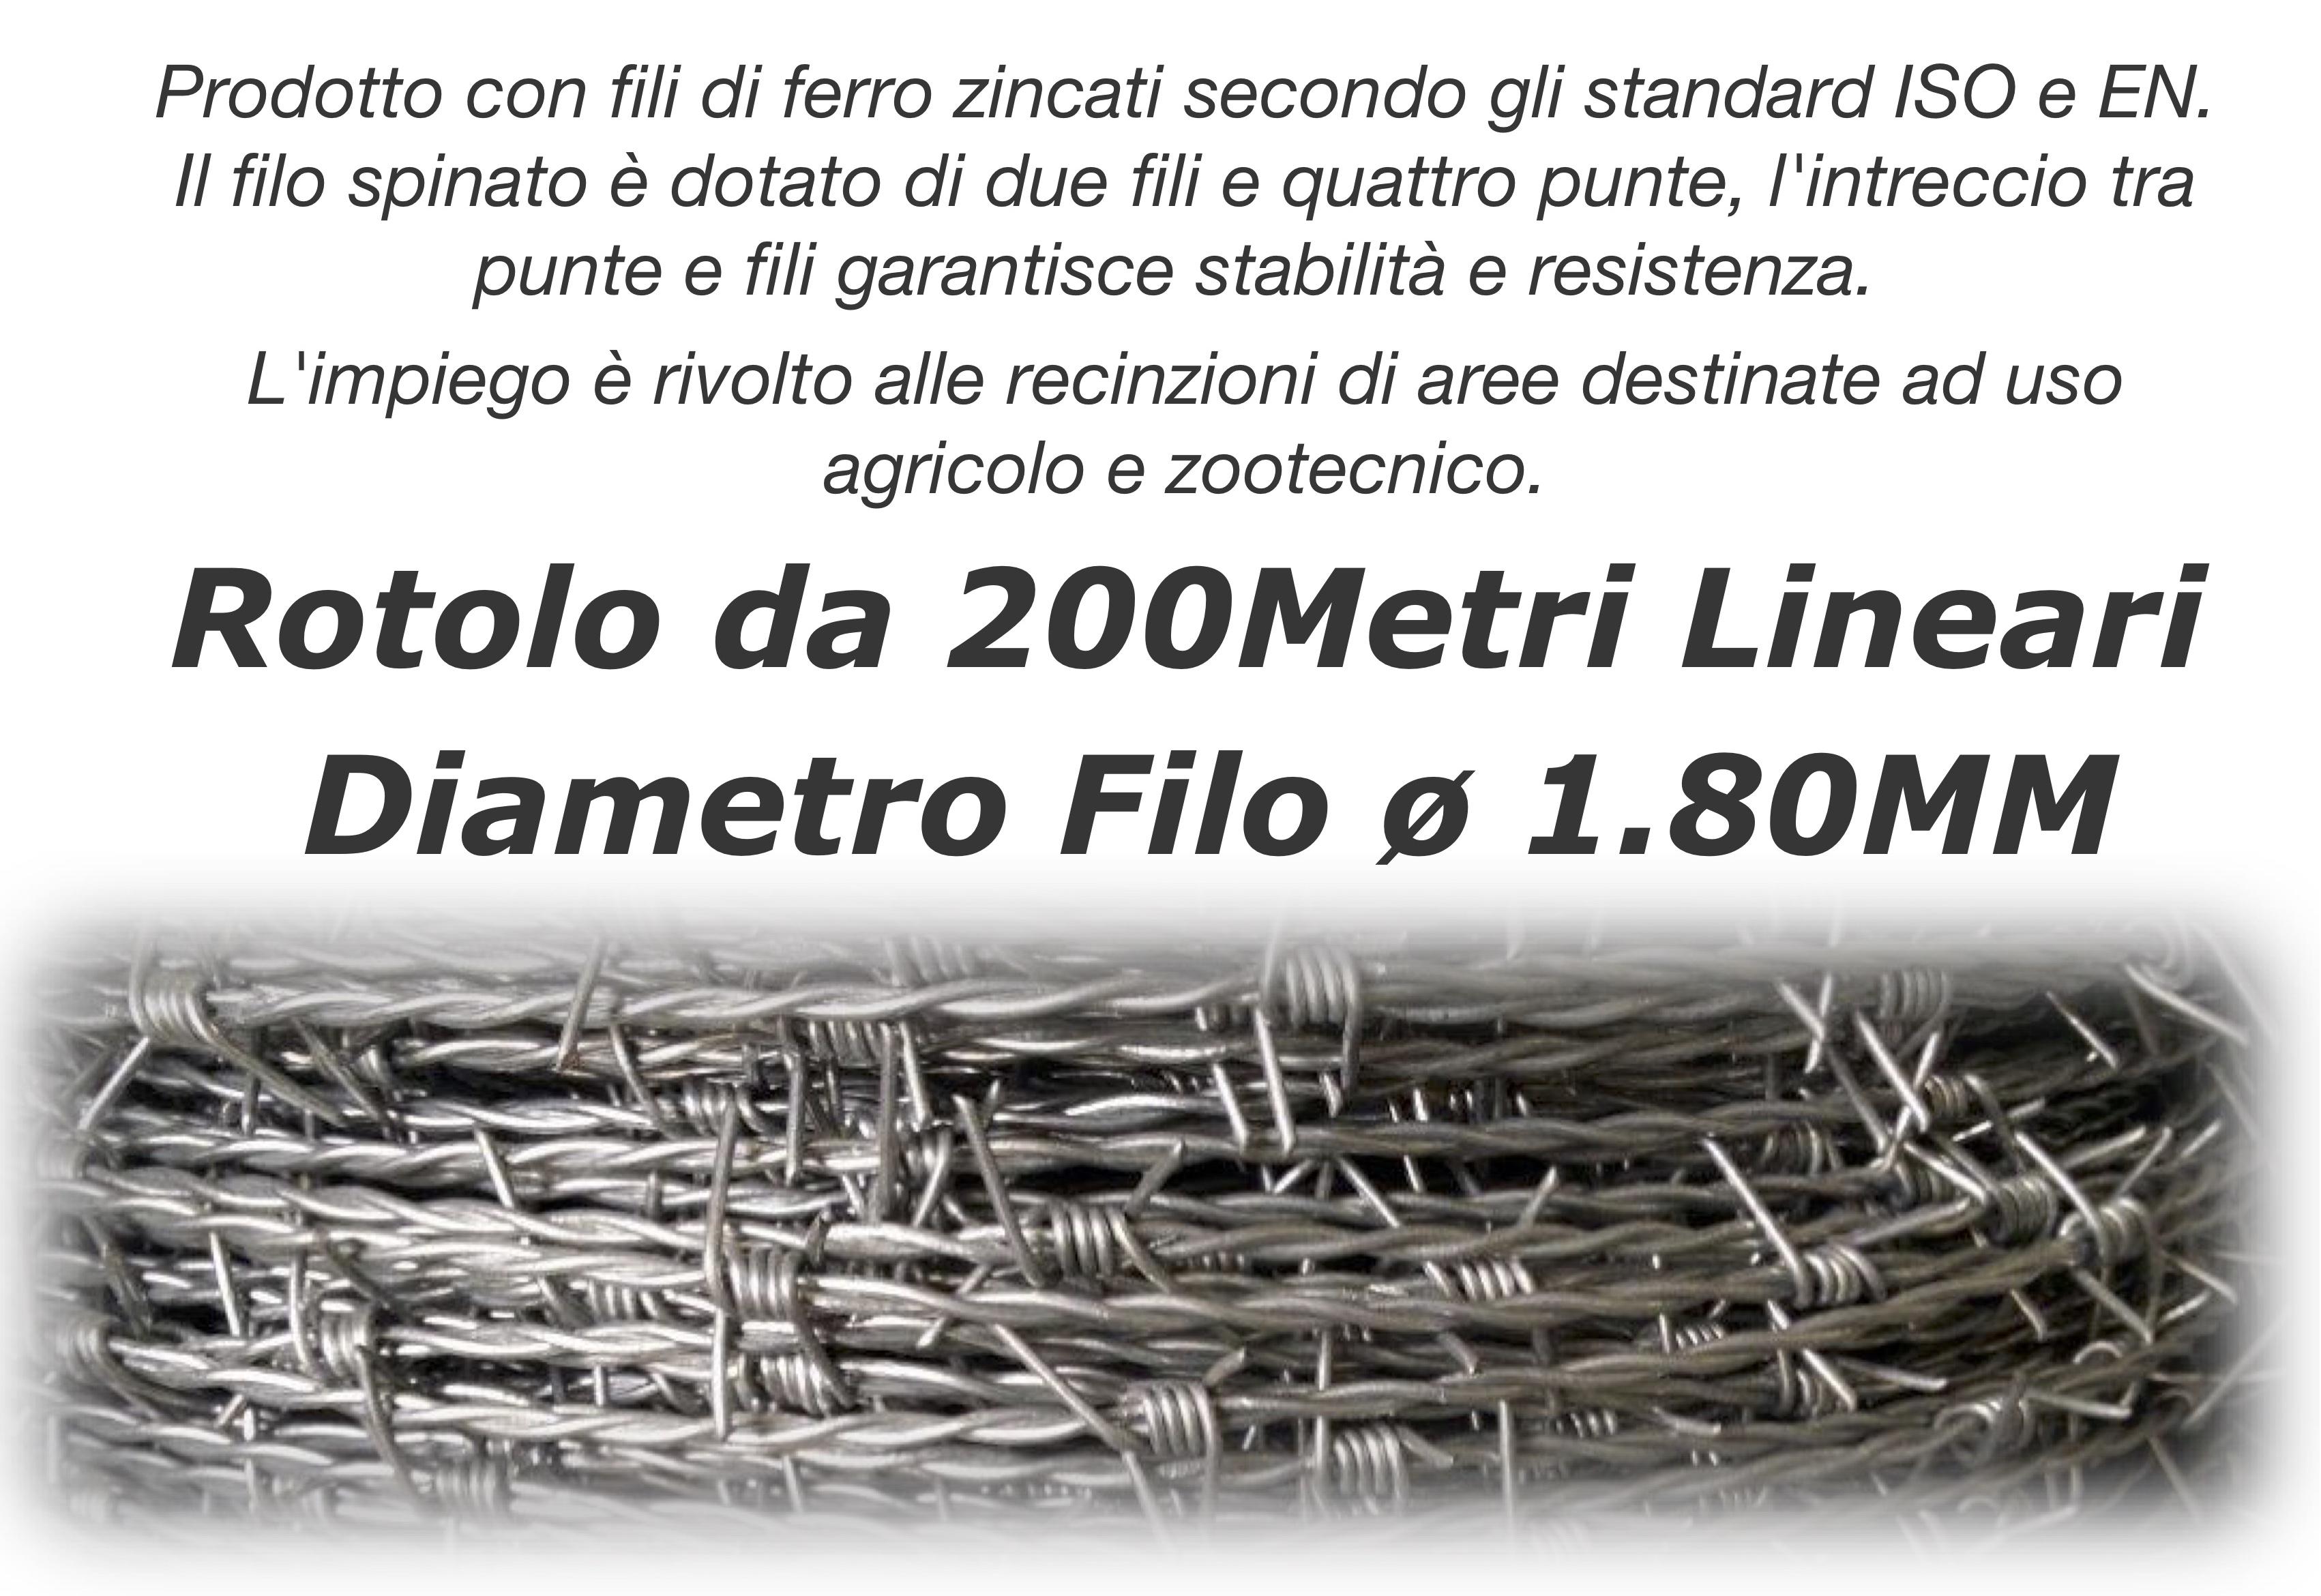 Rotolo da 200Metri Lineari